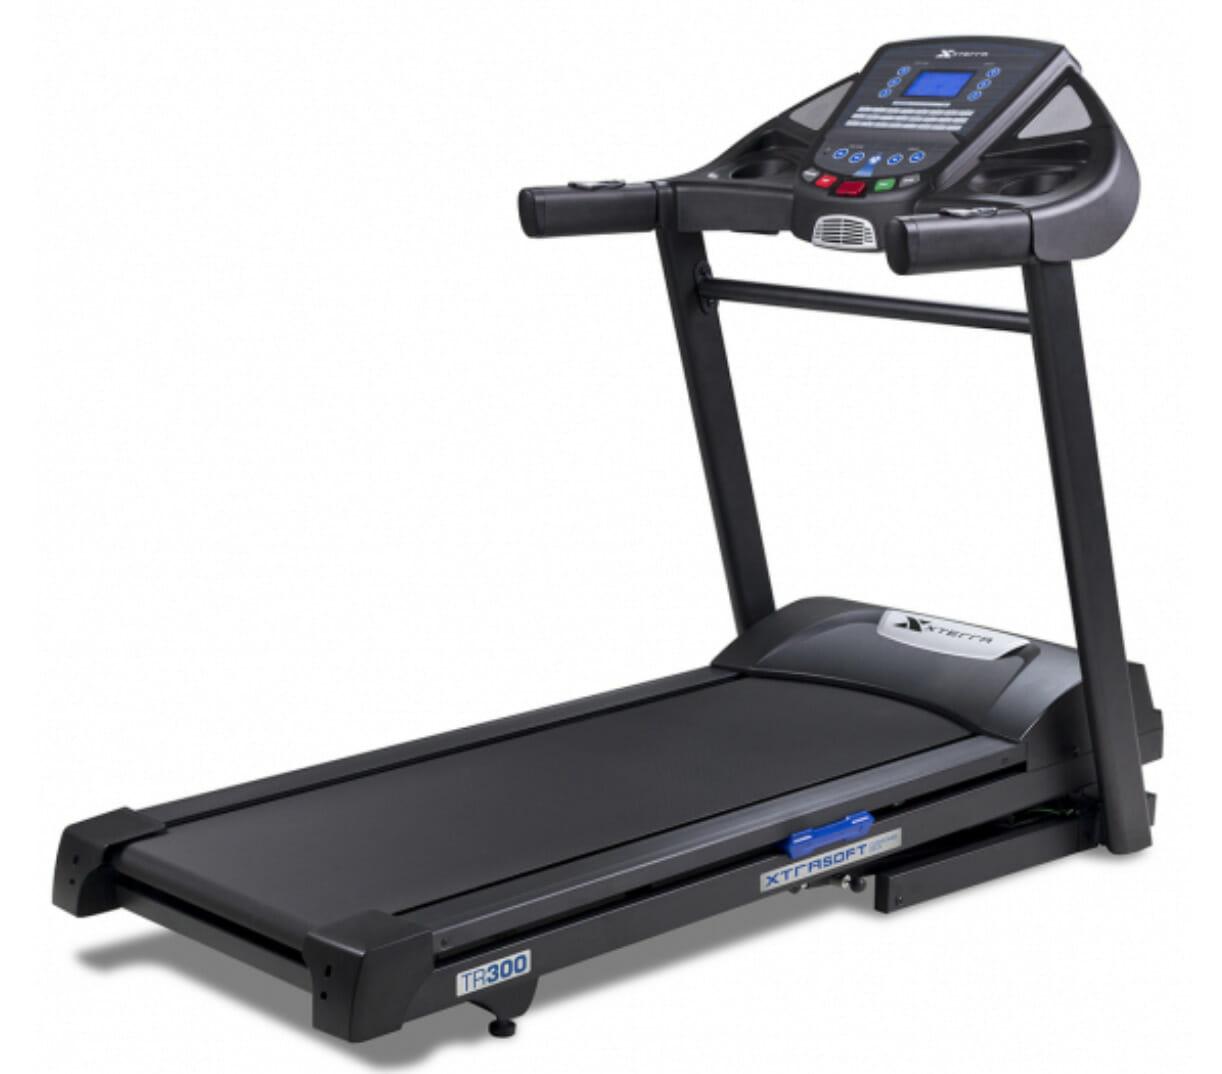 XTERRA TR300 treadmill review